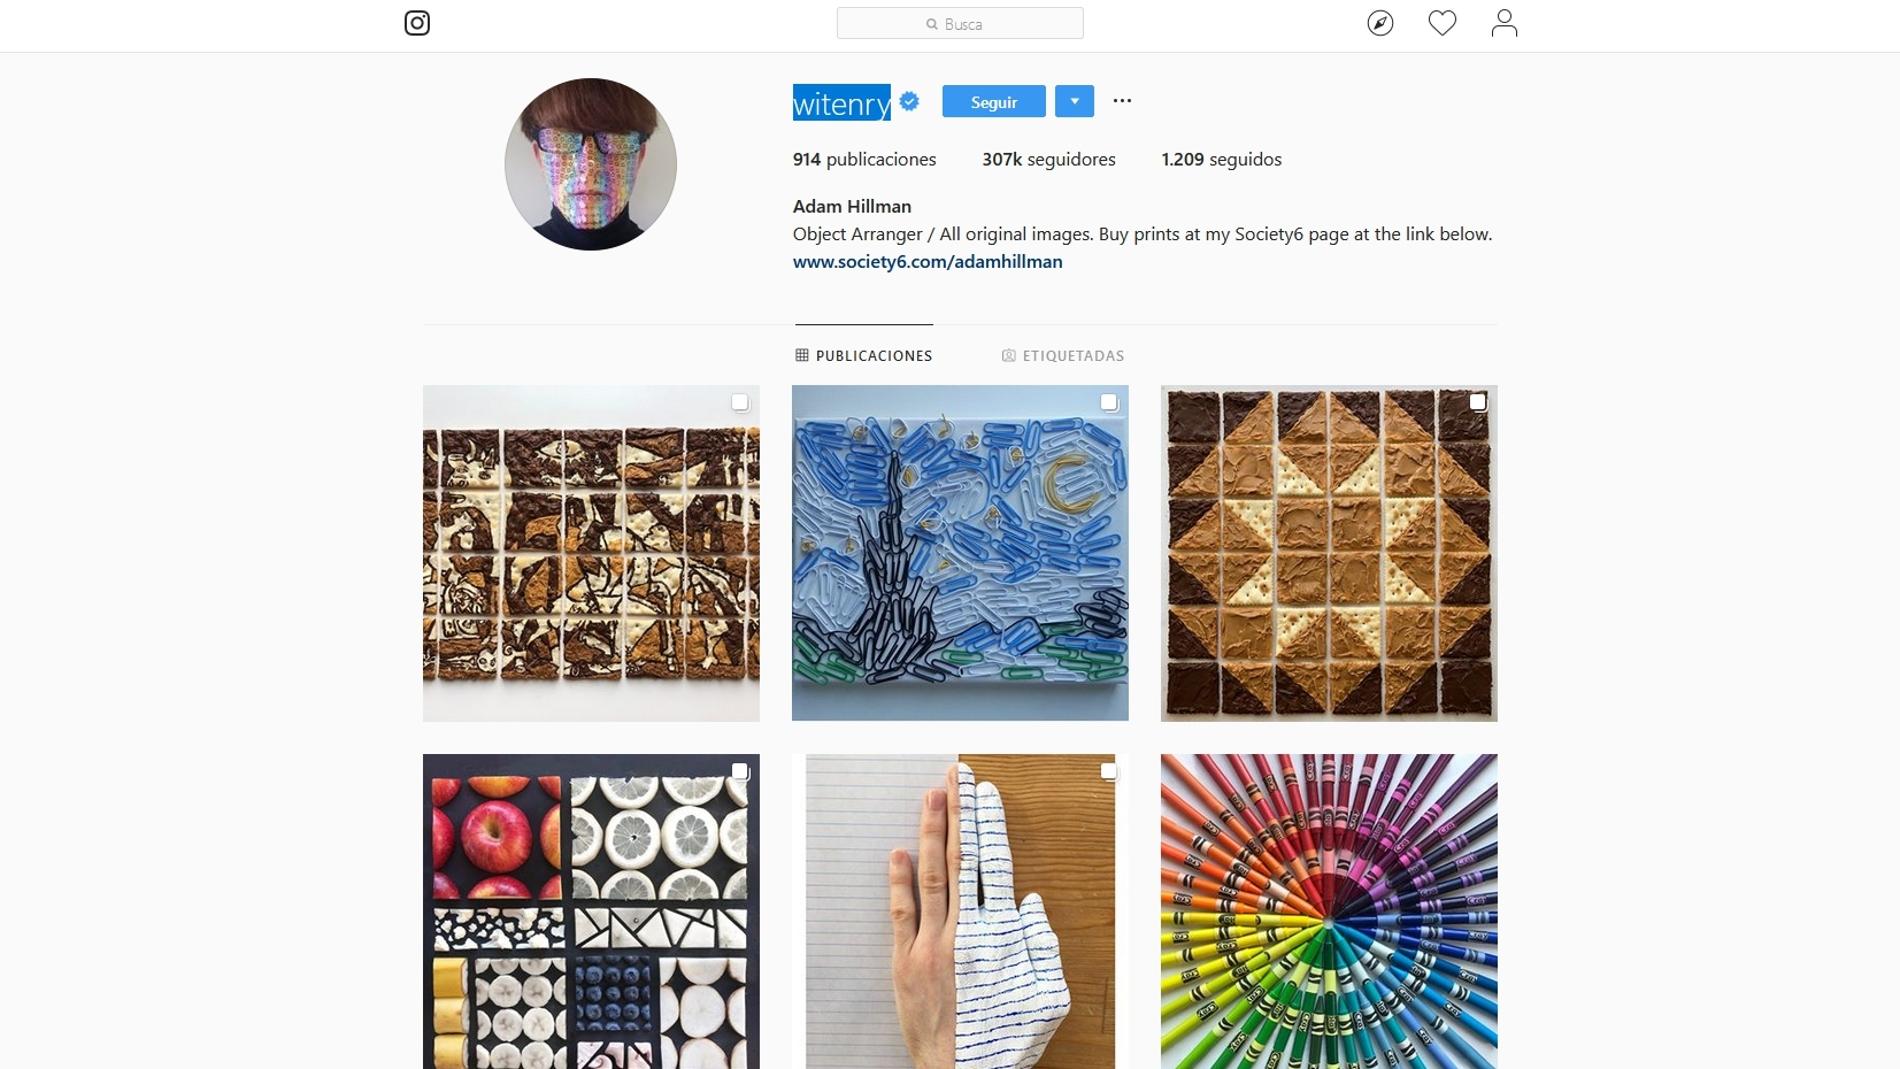 La pagina de Instagram Witenry